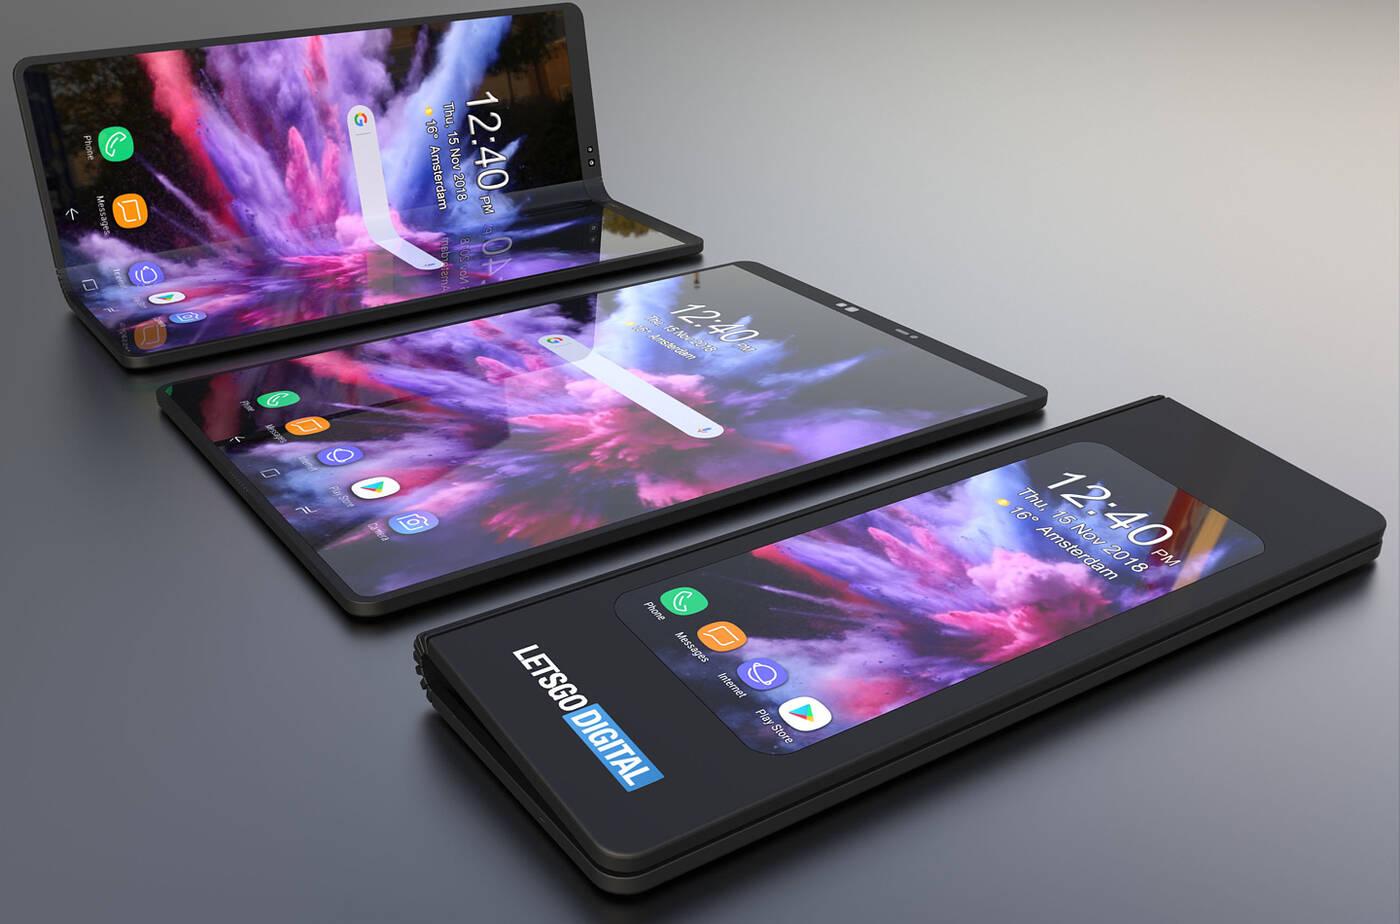 Samsung, składany smartfon Samsung, składany telefon Samsung, Galaxy F, Samsung Galaxy F, render składanego smartfona, render Galaxy F